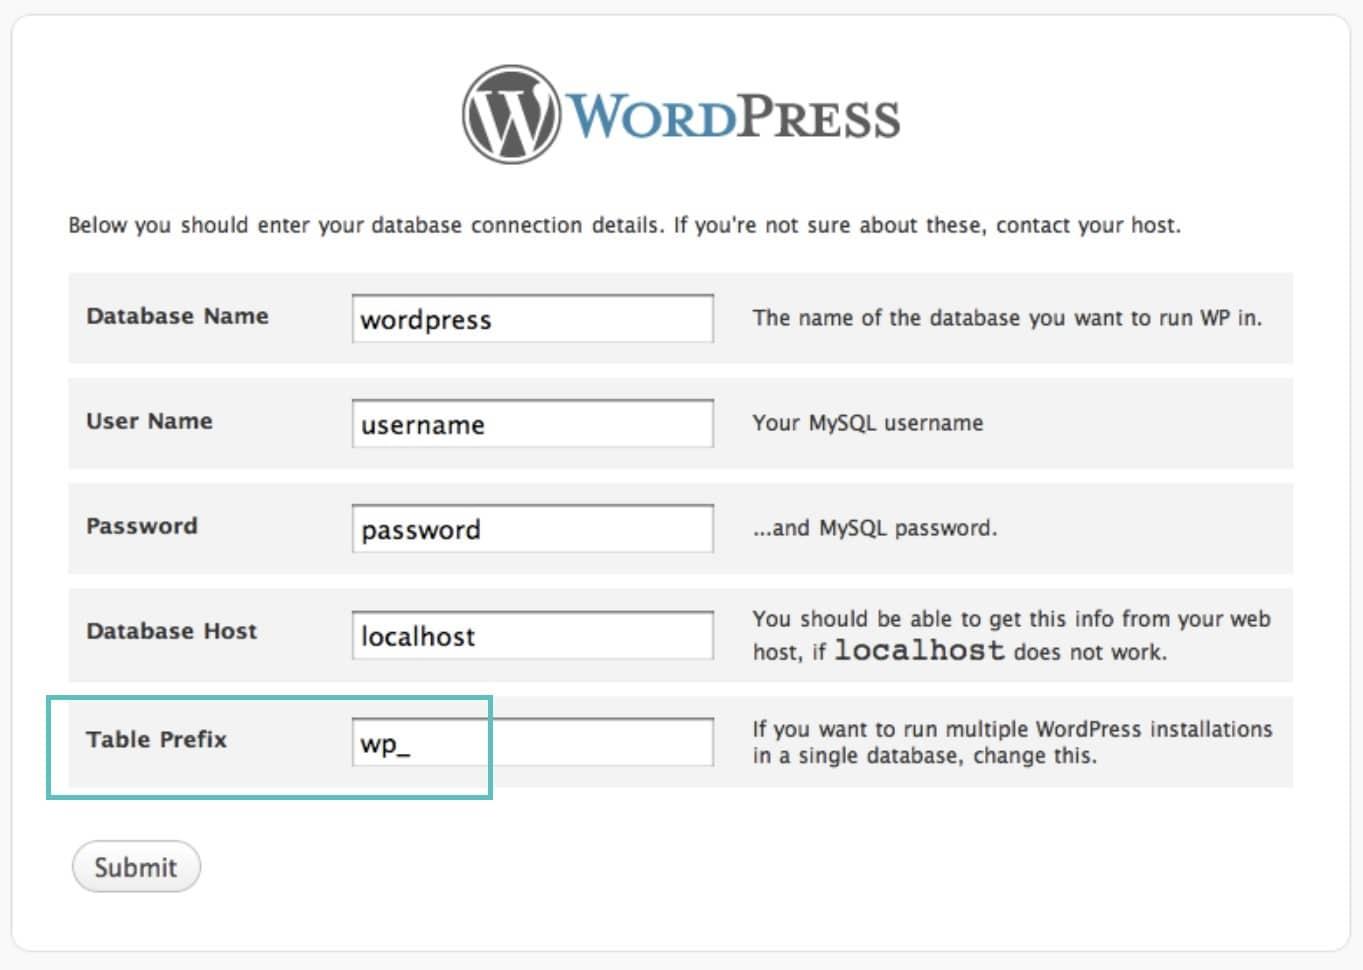 WordPress tabelprefix